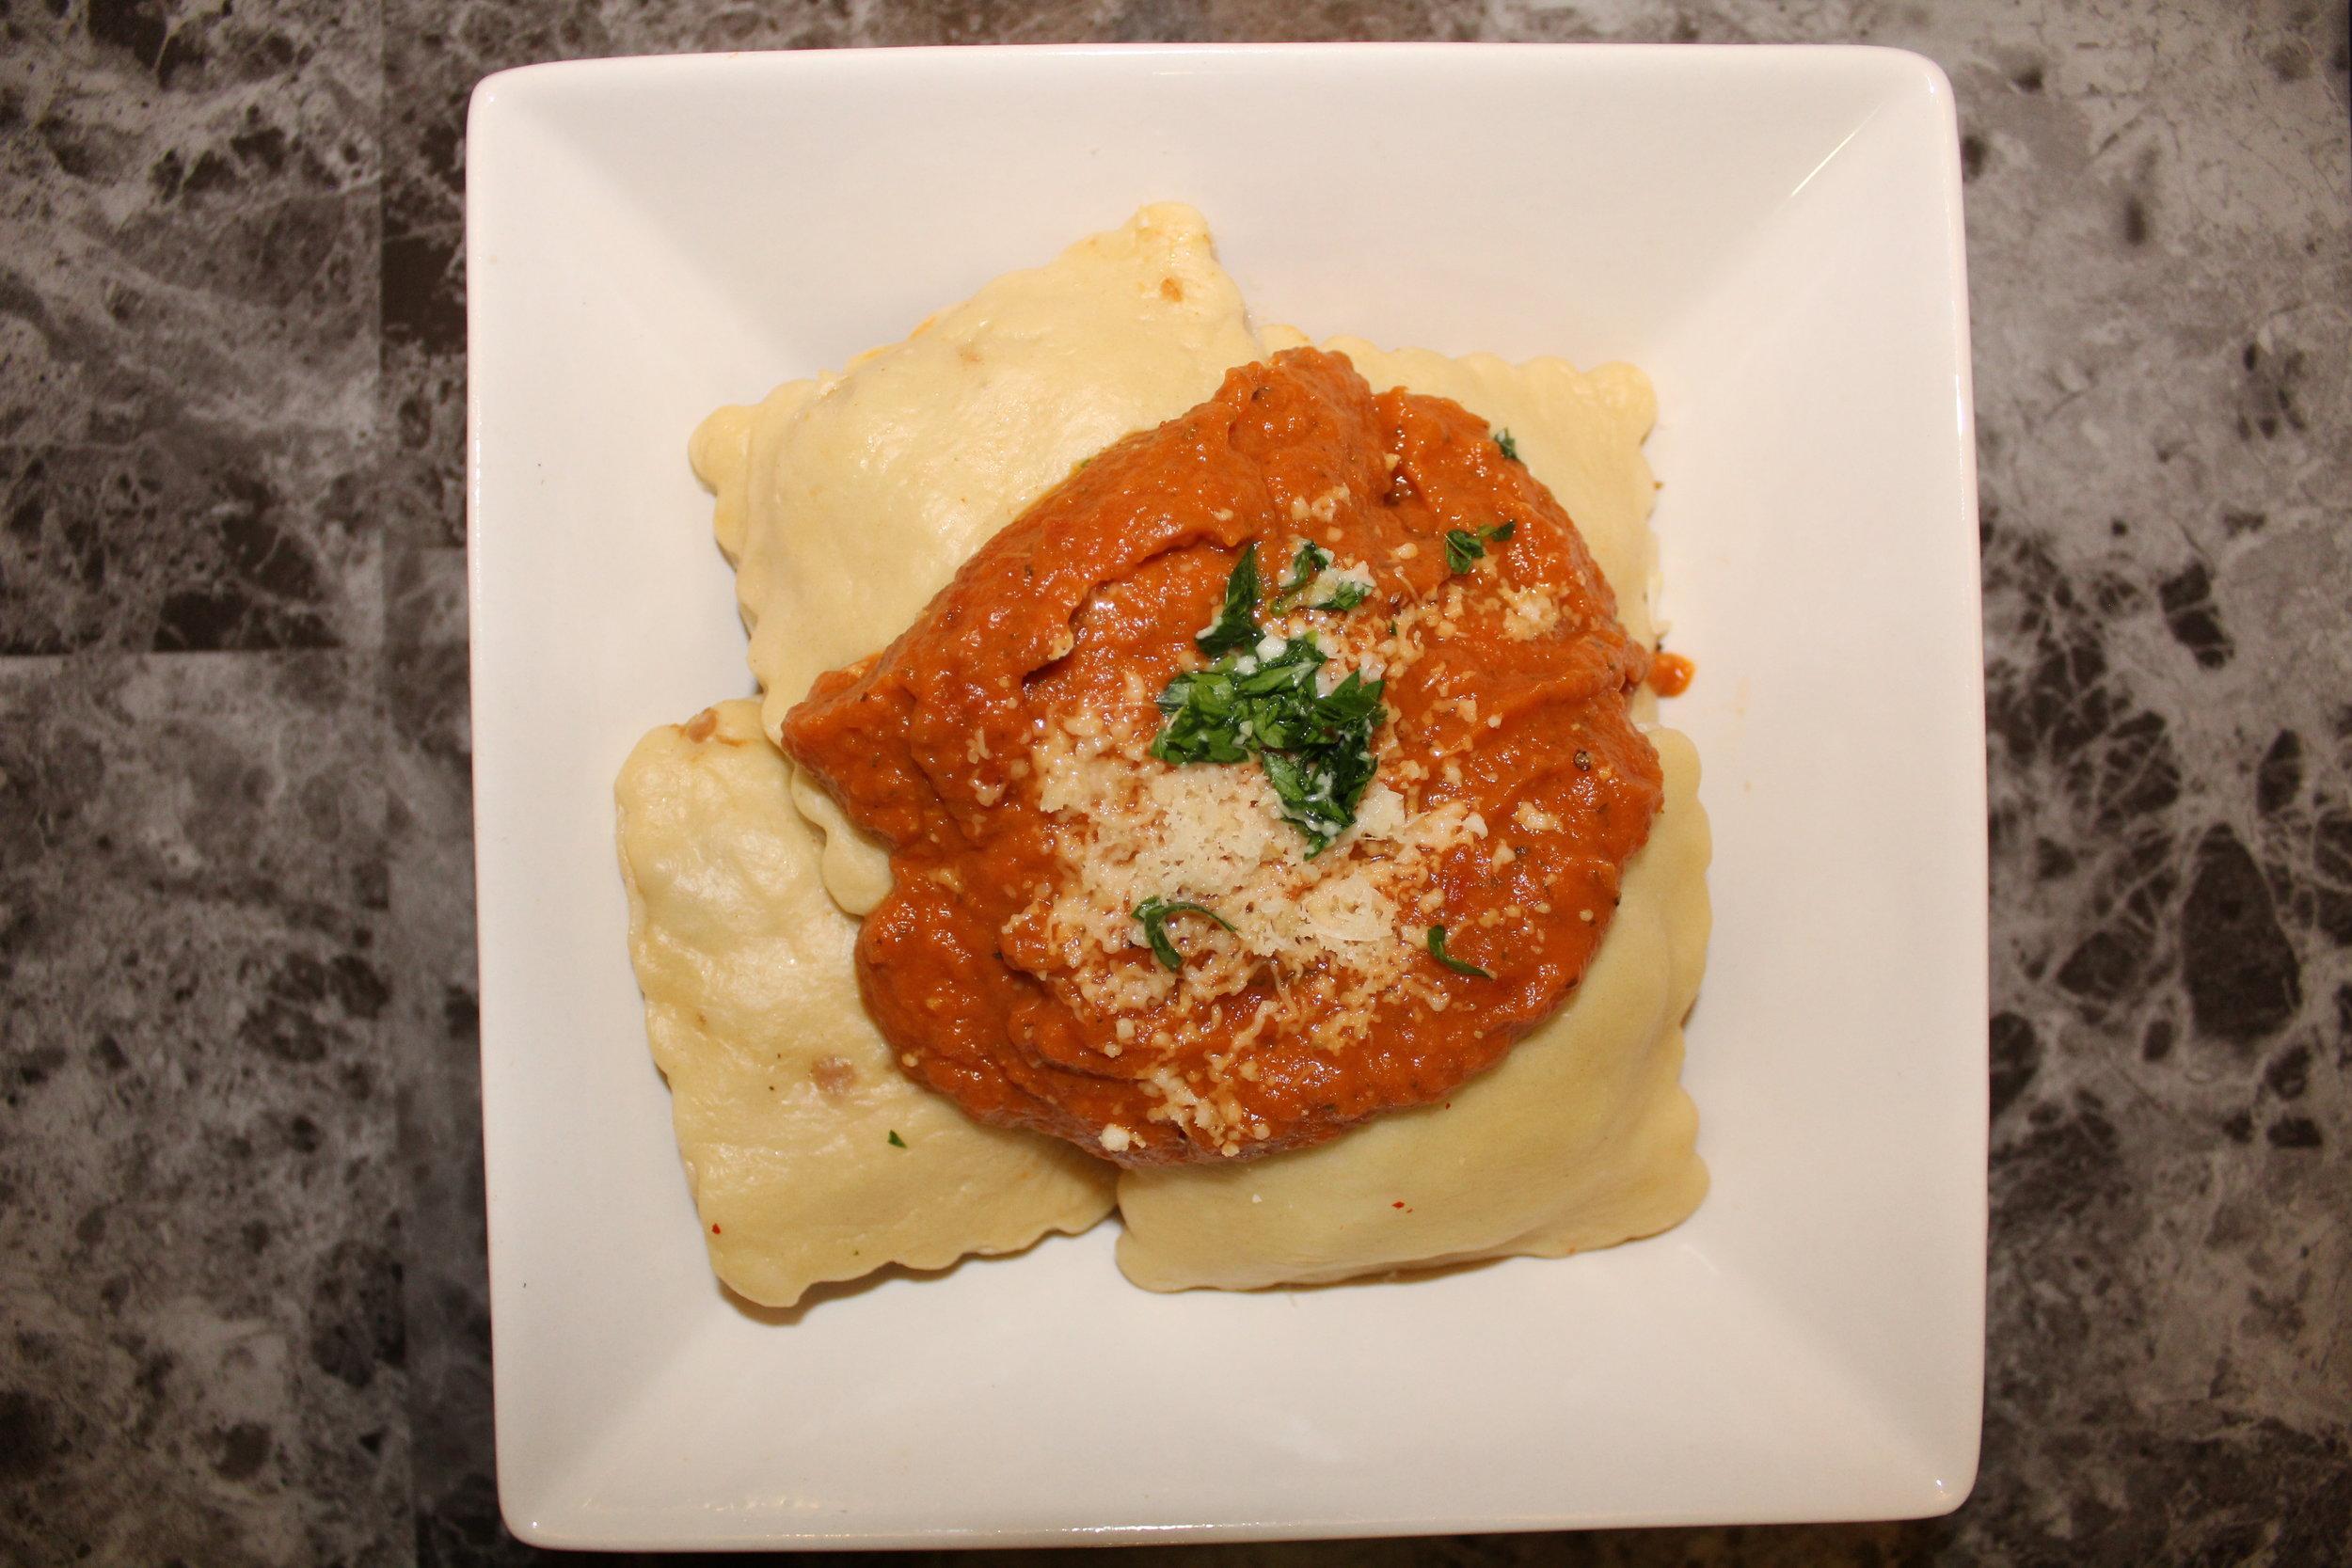 Spicy chicken sausage ravioli with